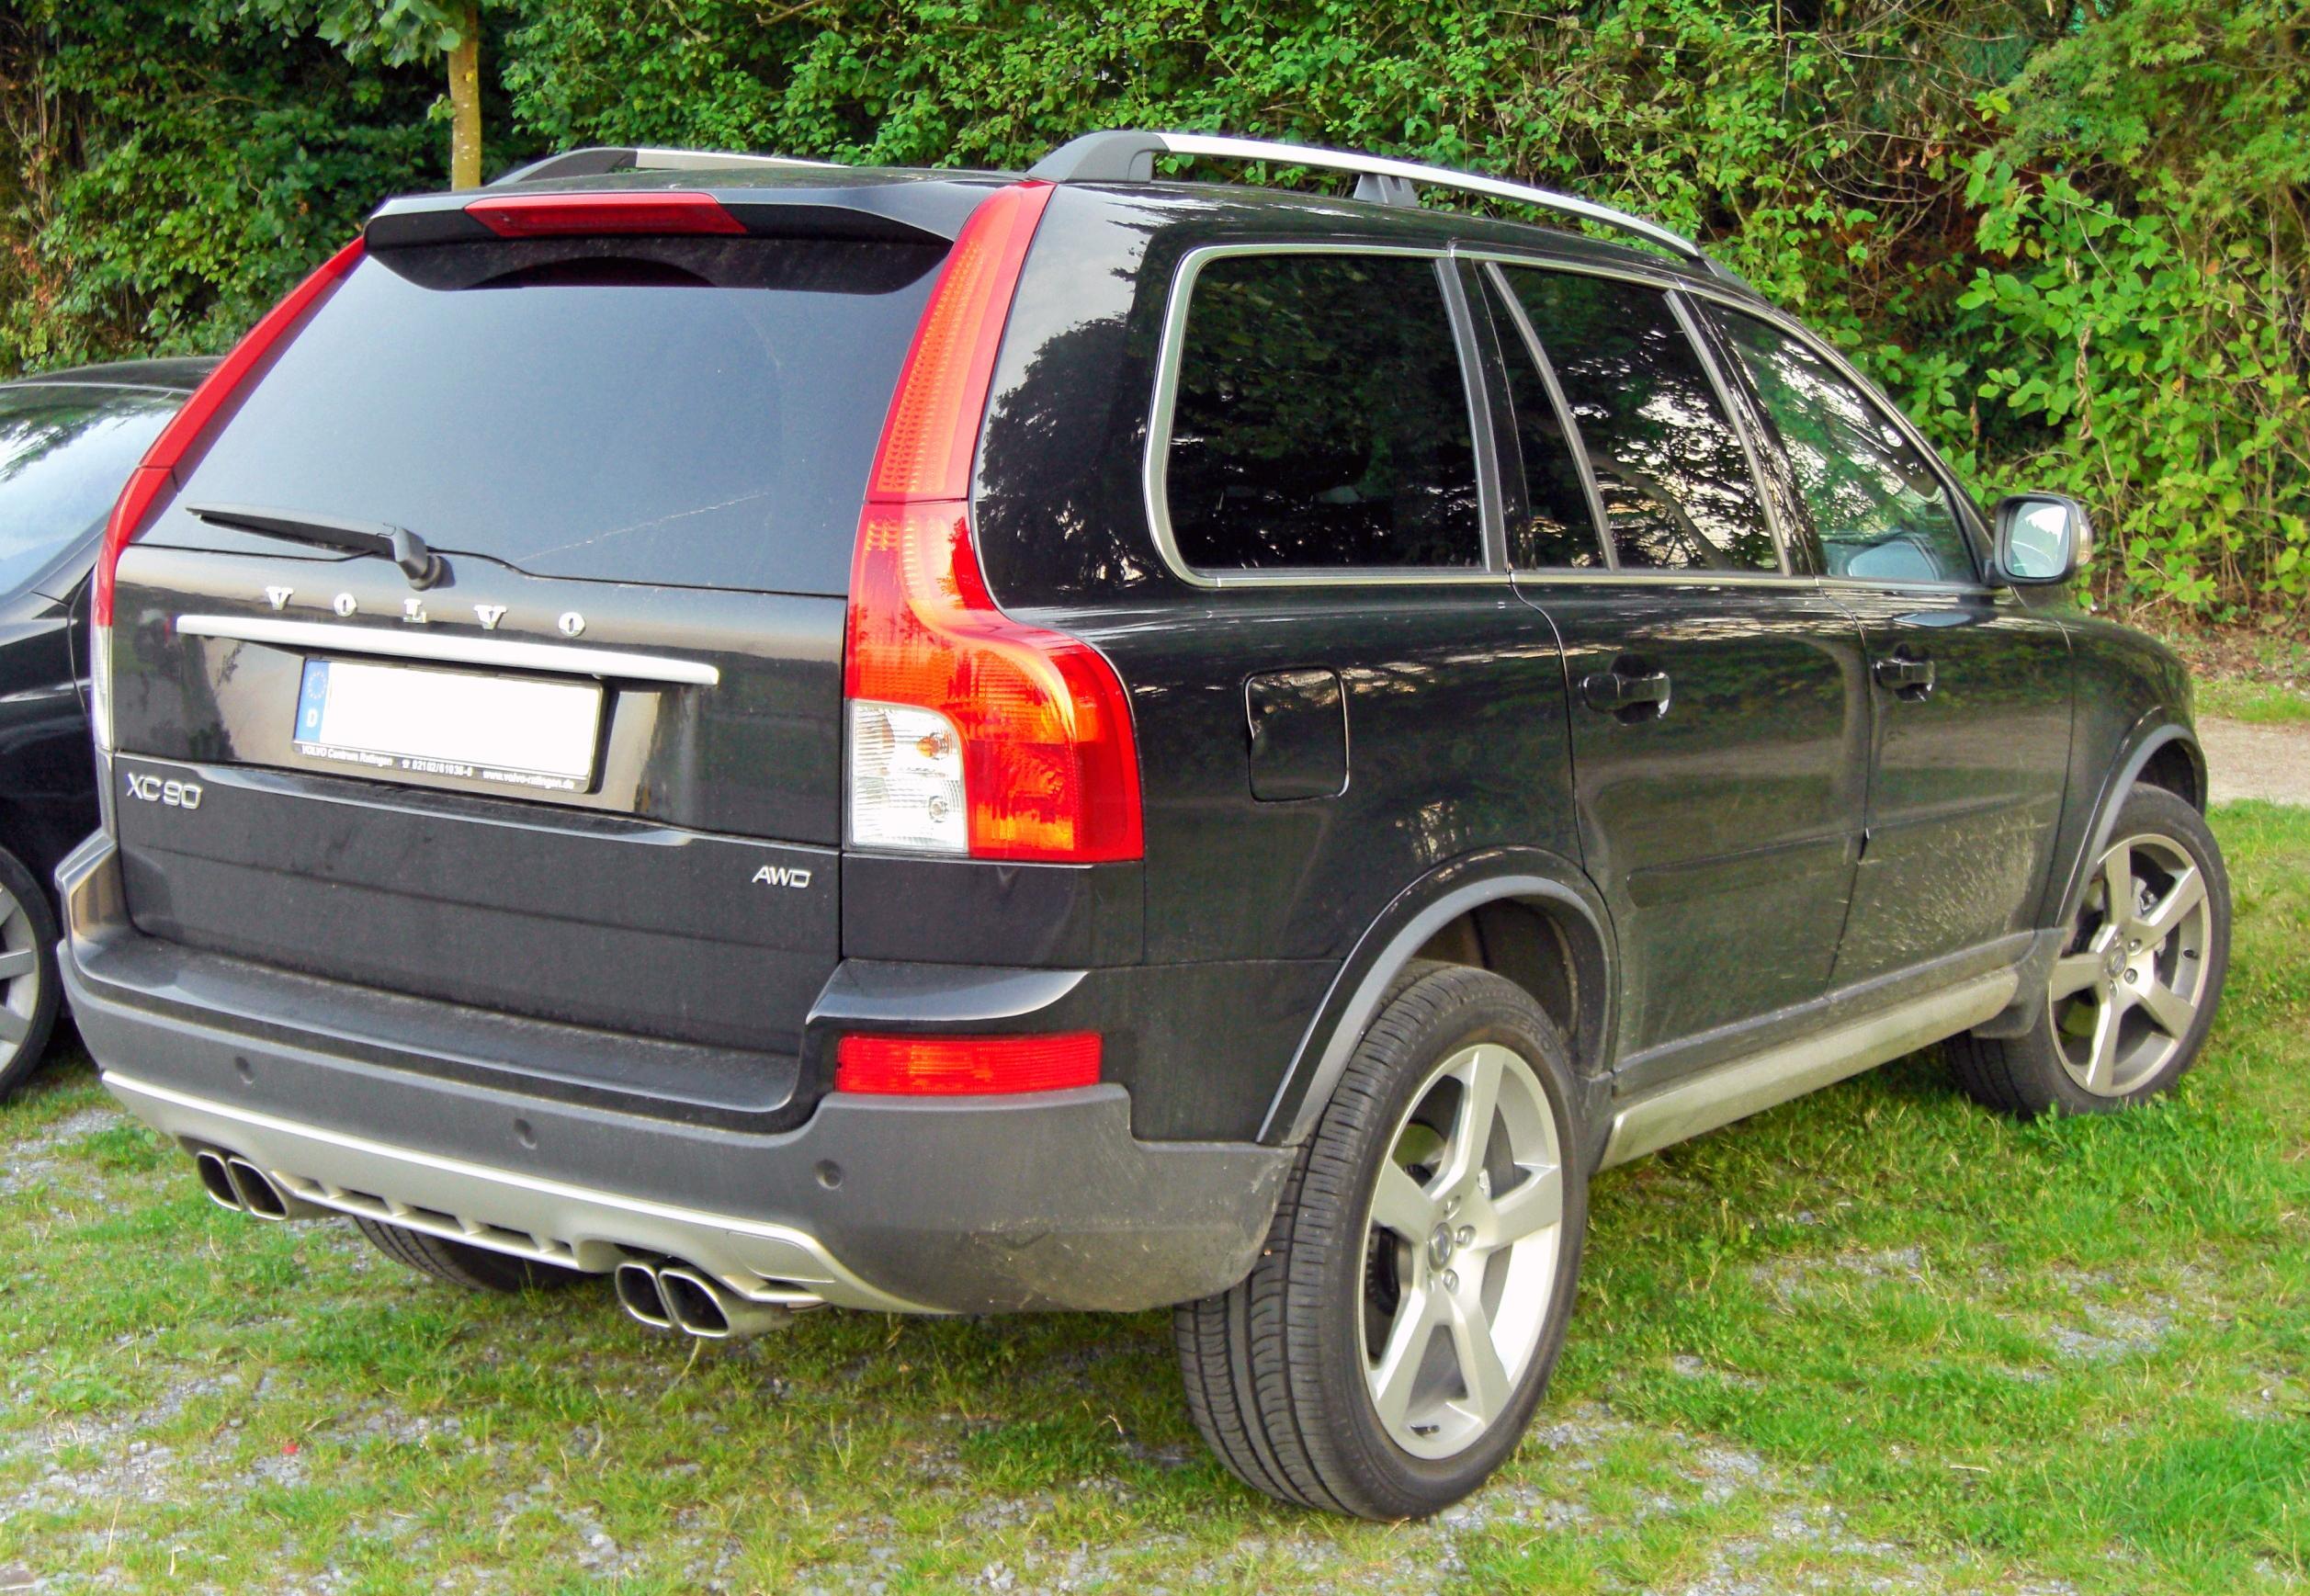 File Volvo Xc90 Facelift Edition R Design 20090803 Rear